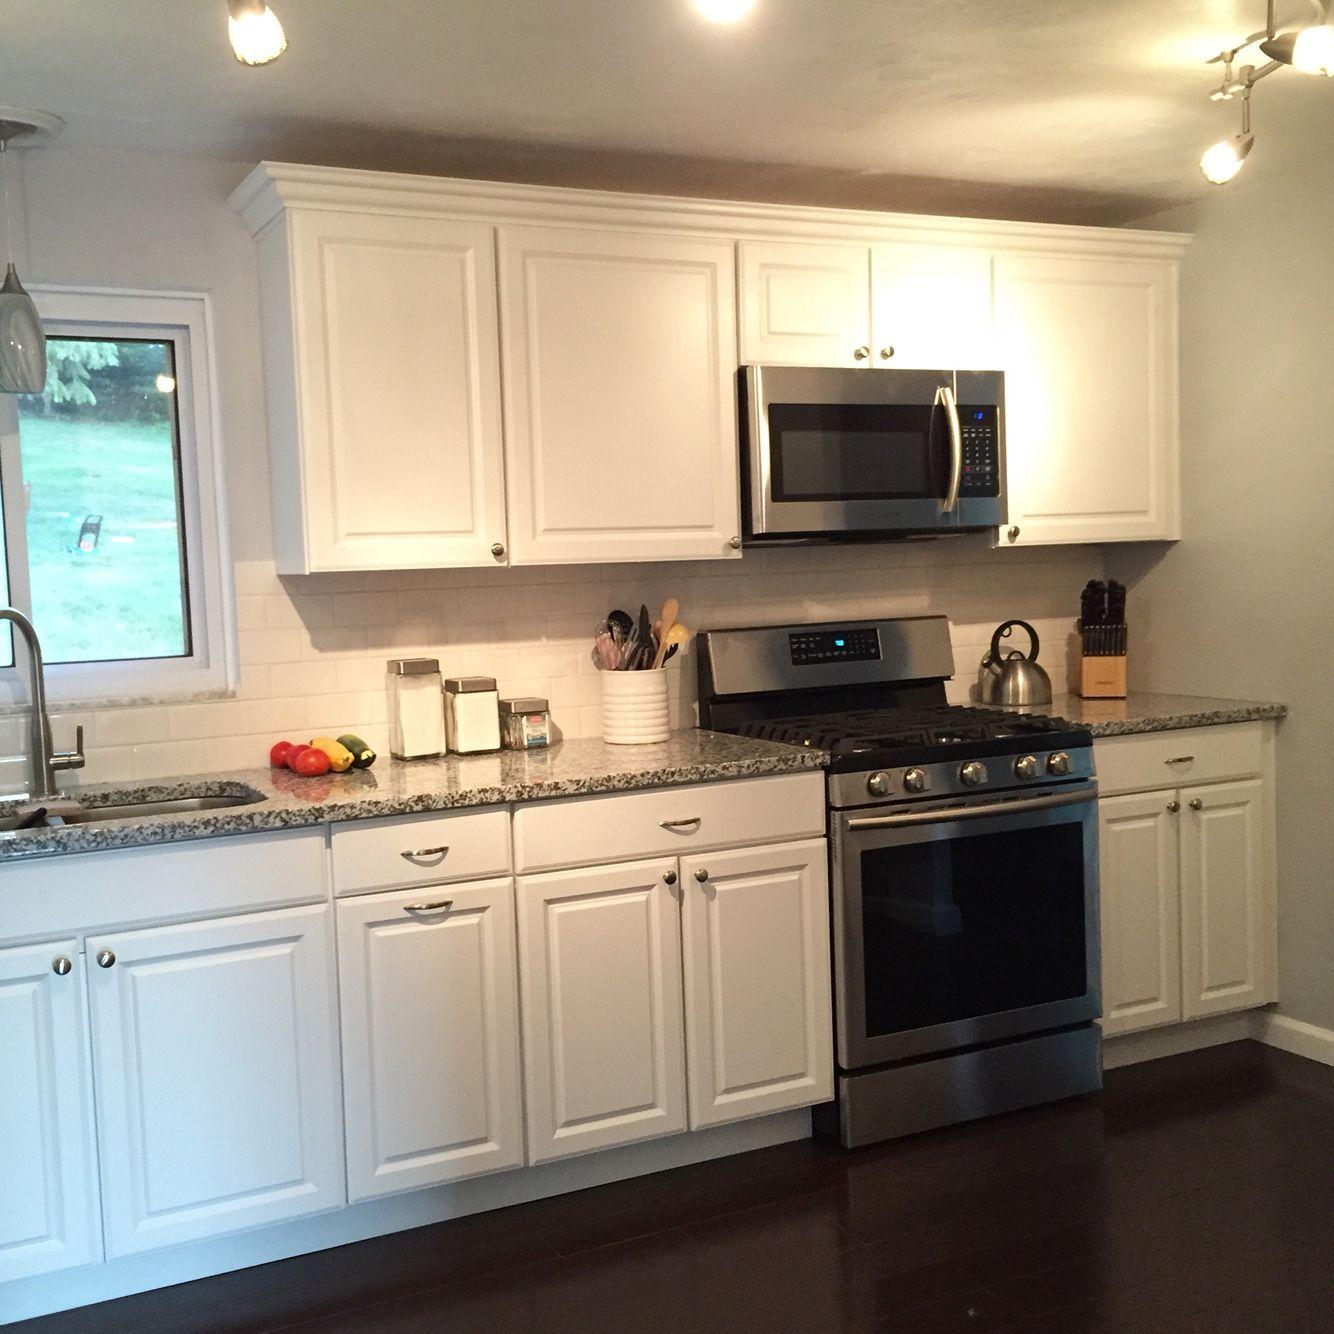 Image Result For White Kitchen Cabinets With Luna Pearl Granite White Kitchen Makeover Kitchen Remodel Countertops Backsplash For White Cabinets